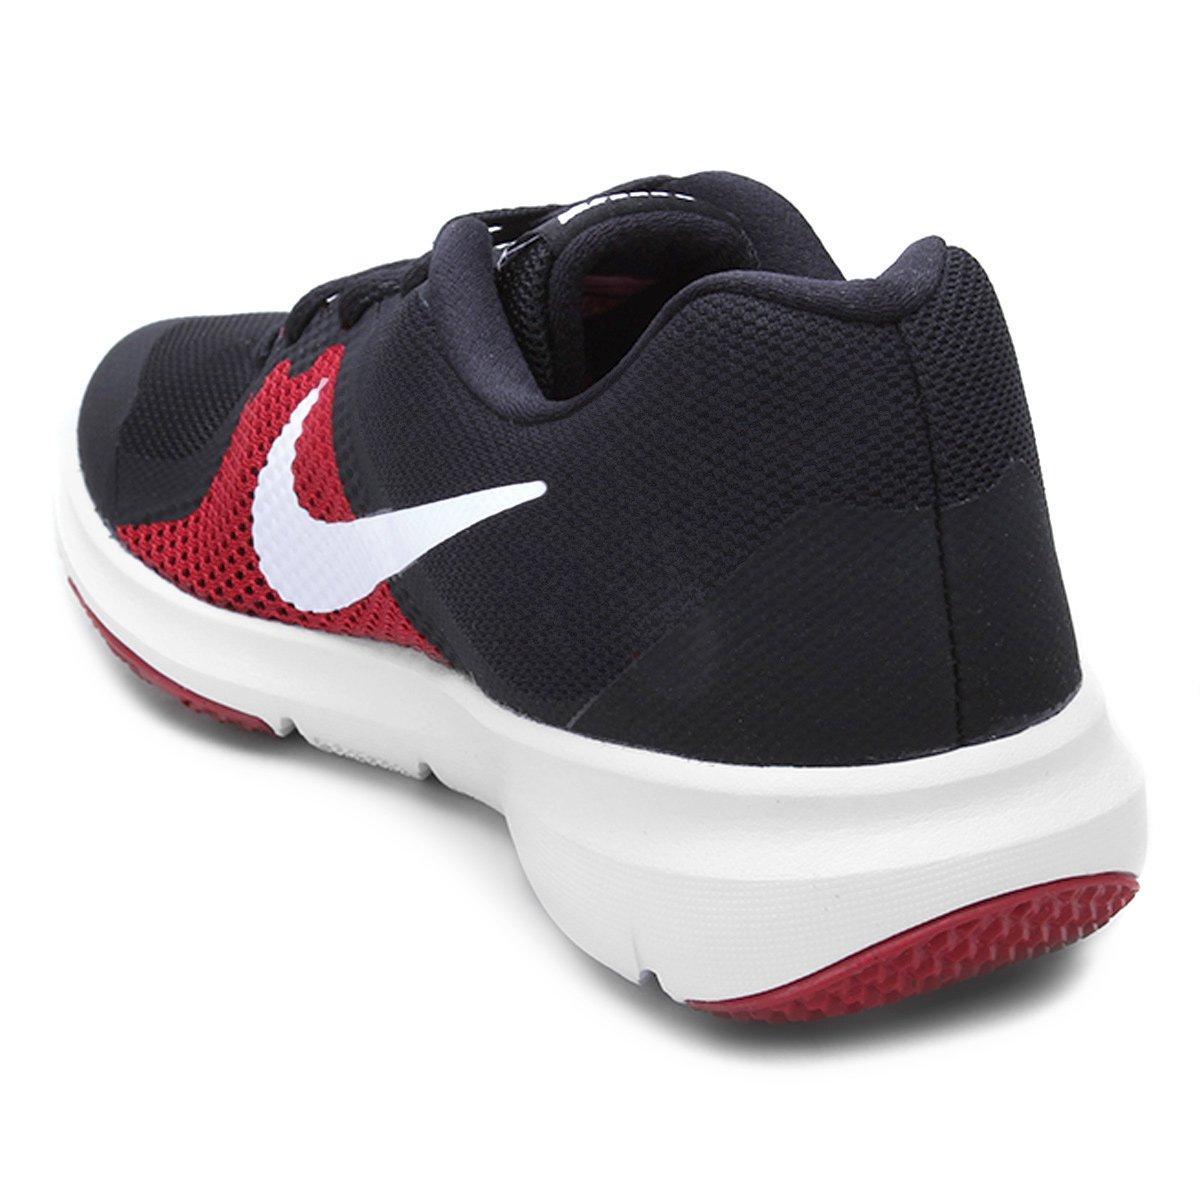 2596e72c215 ... Tênis Nike Flex Control Masculino - Preto+Branco. OFERTAS  OPEC